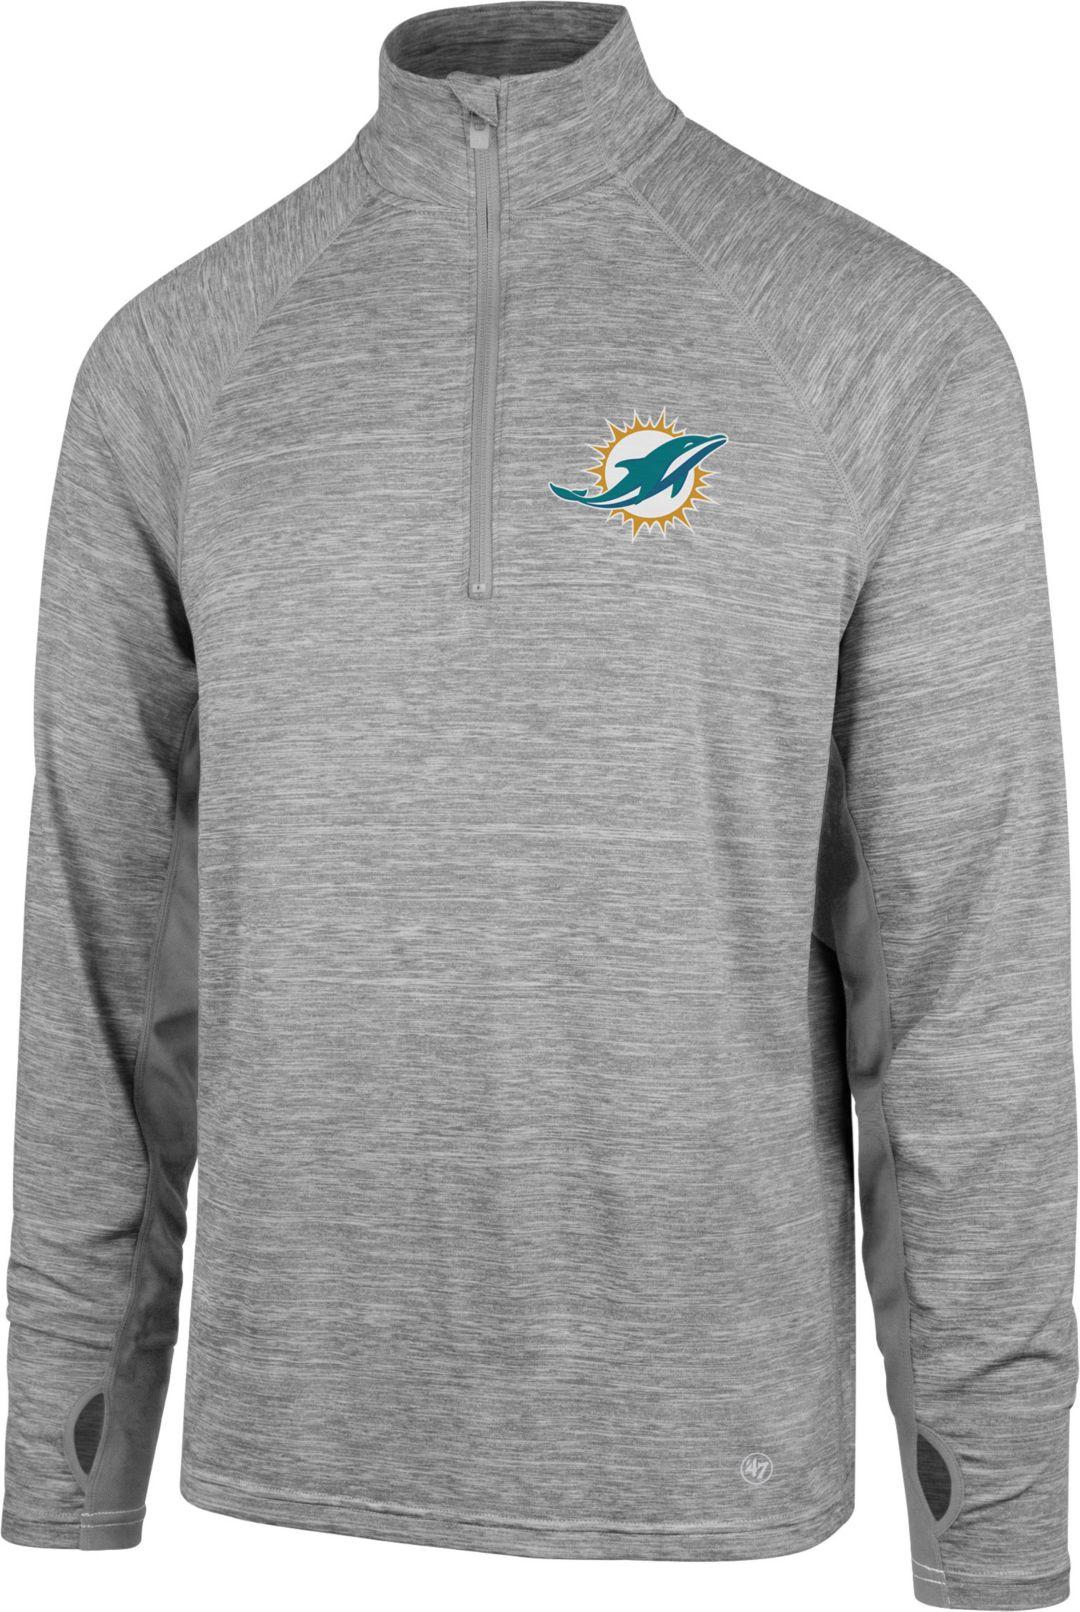 save off 51e1b 0cd4e '47 Men's Miami Dolphins Forward Grey Quarter-Zip Pullover